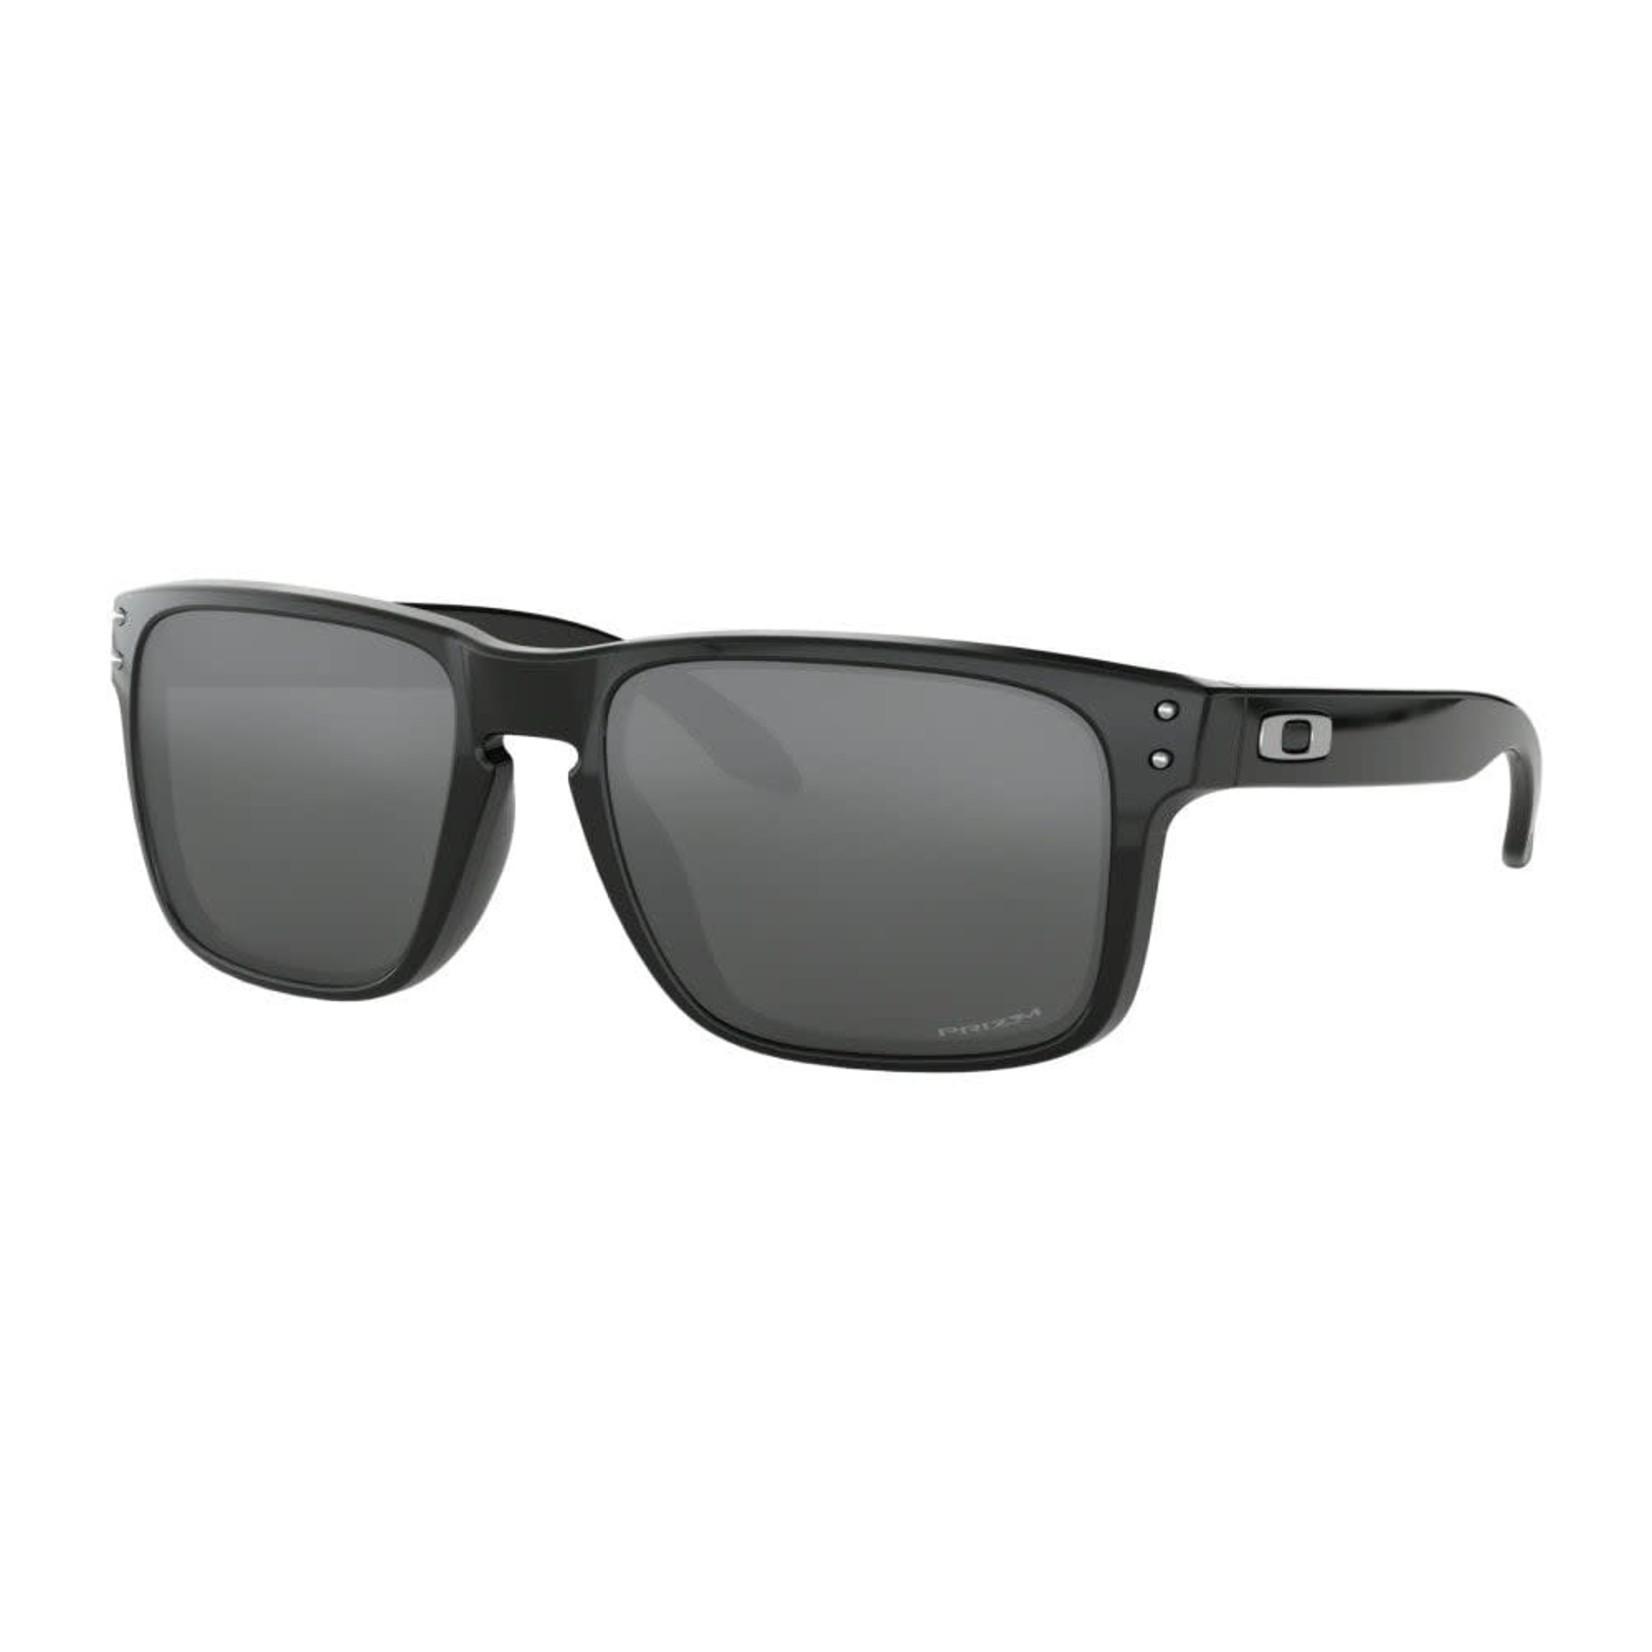 Oakley Oakley Sunglasses, Holbrook, Polished Blk, Prizm Blk Iridium